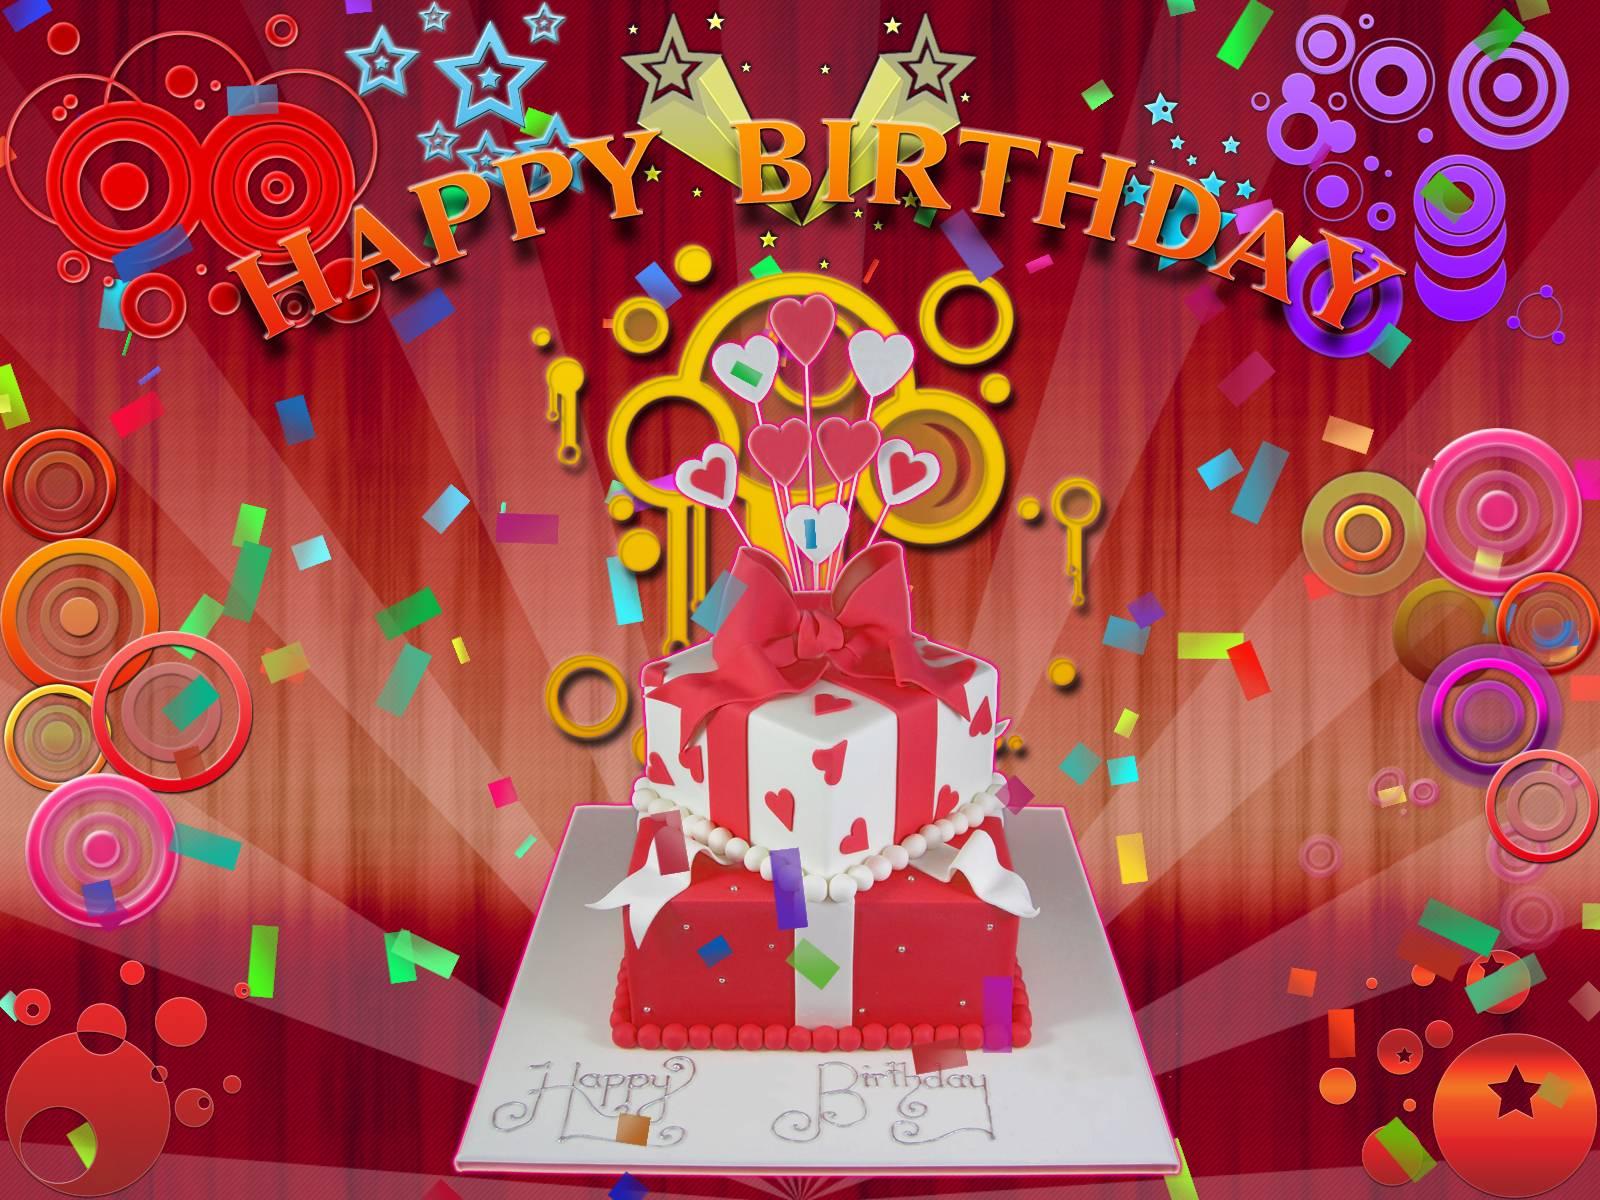 Happy Birthday Wallpaper Free Download Sf Wallpaper